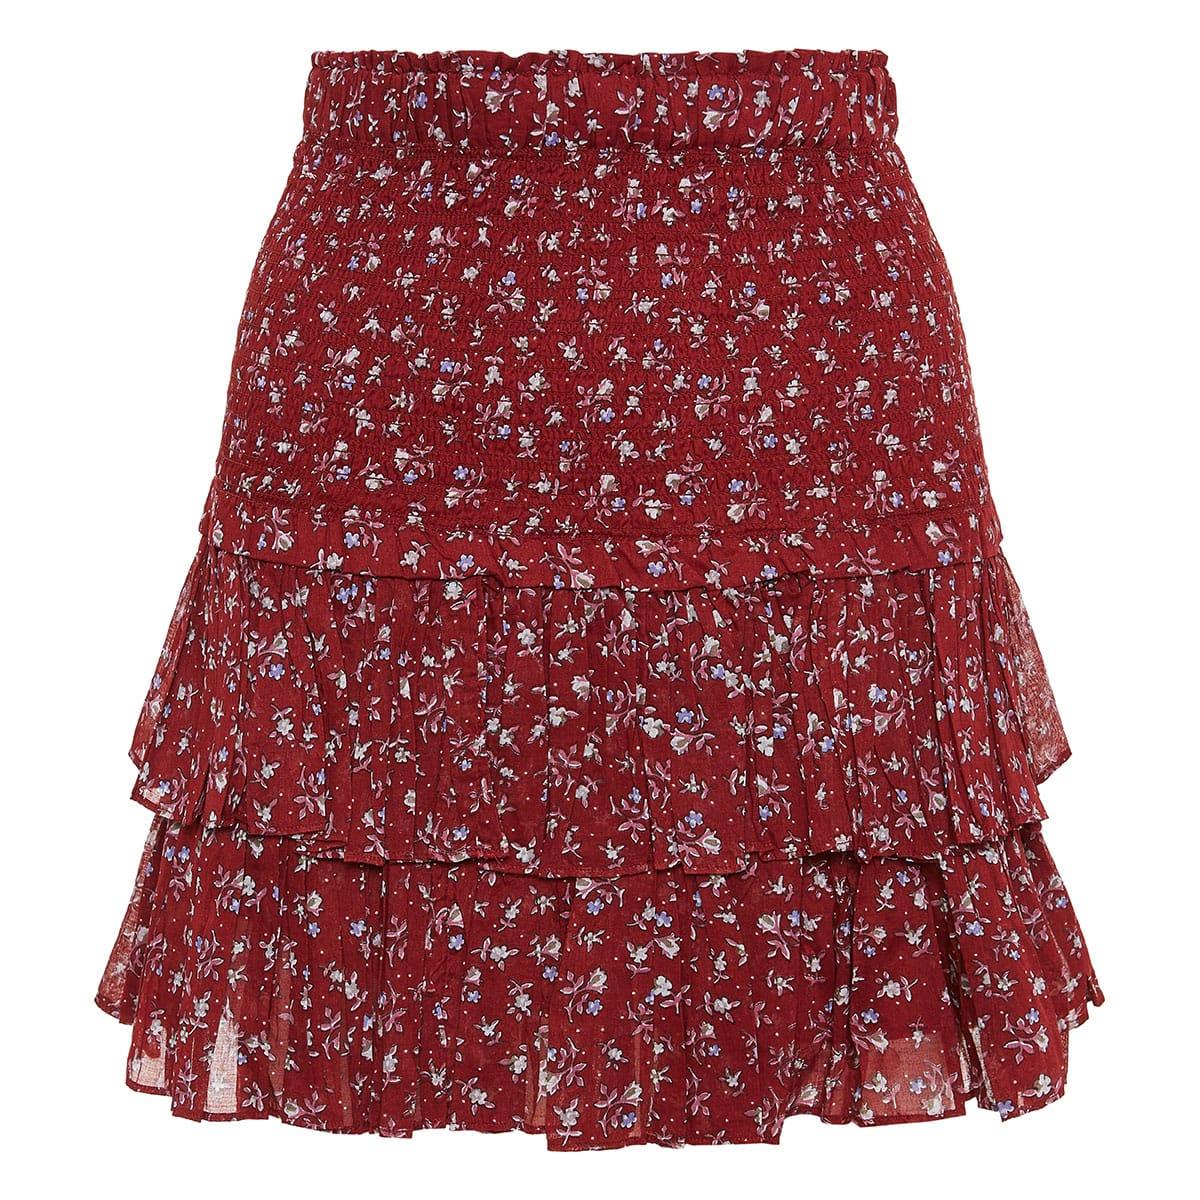 Naomi floral ruffled mini skirt